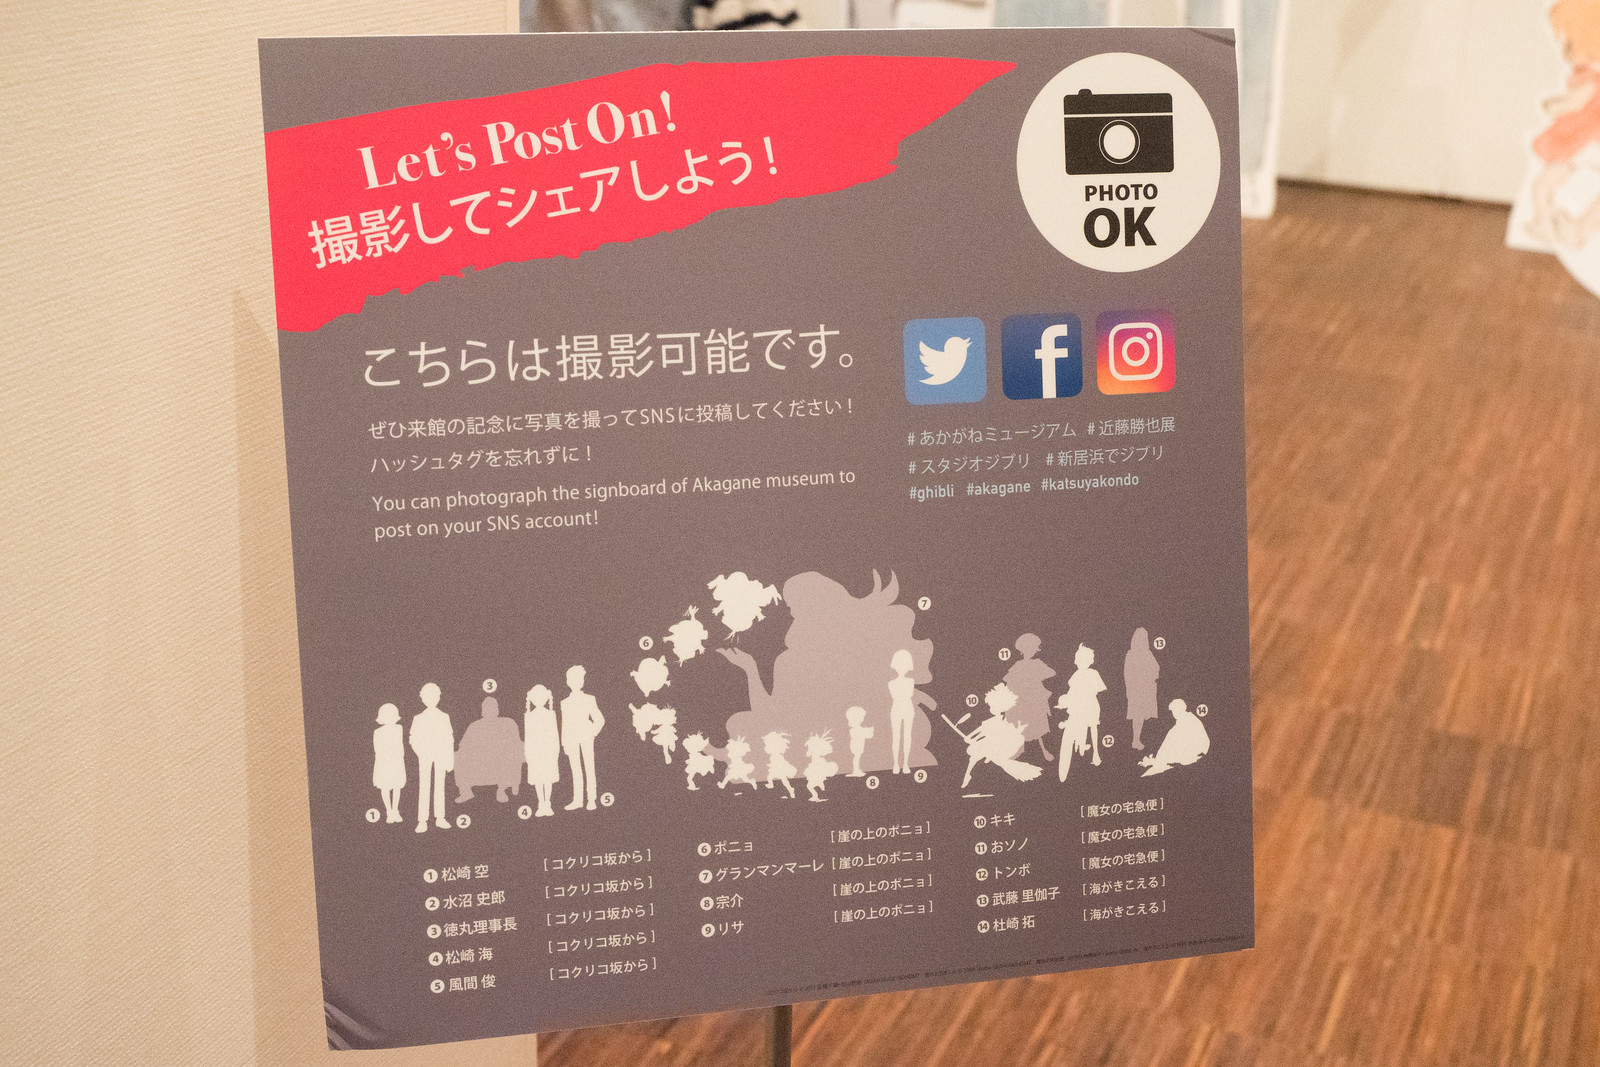 Ghibli_katsuyakondo-15